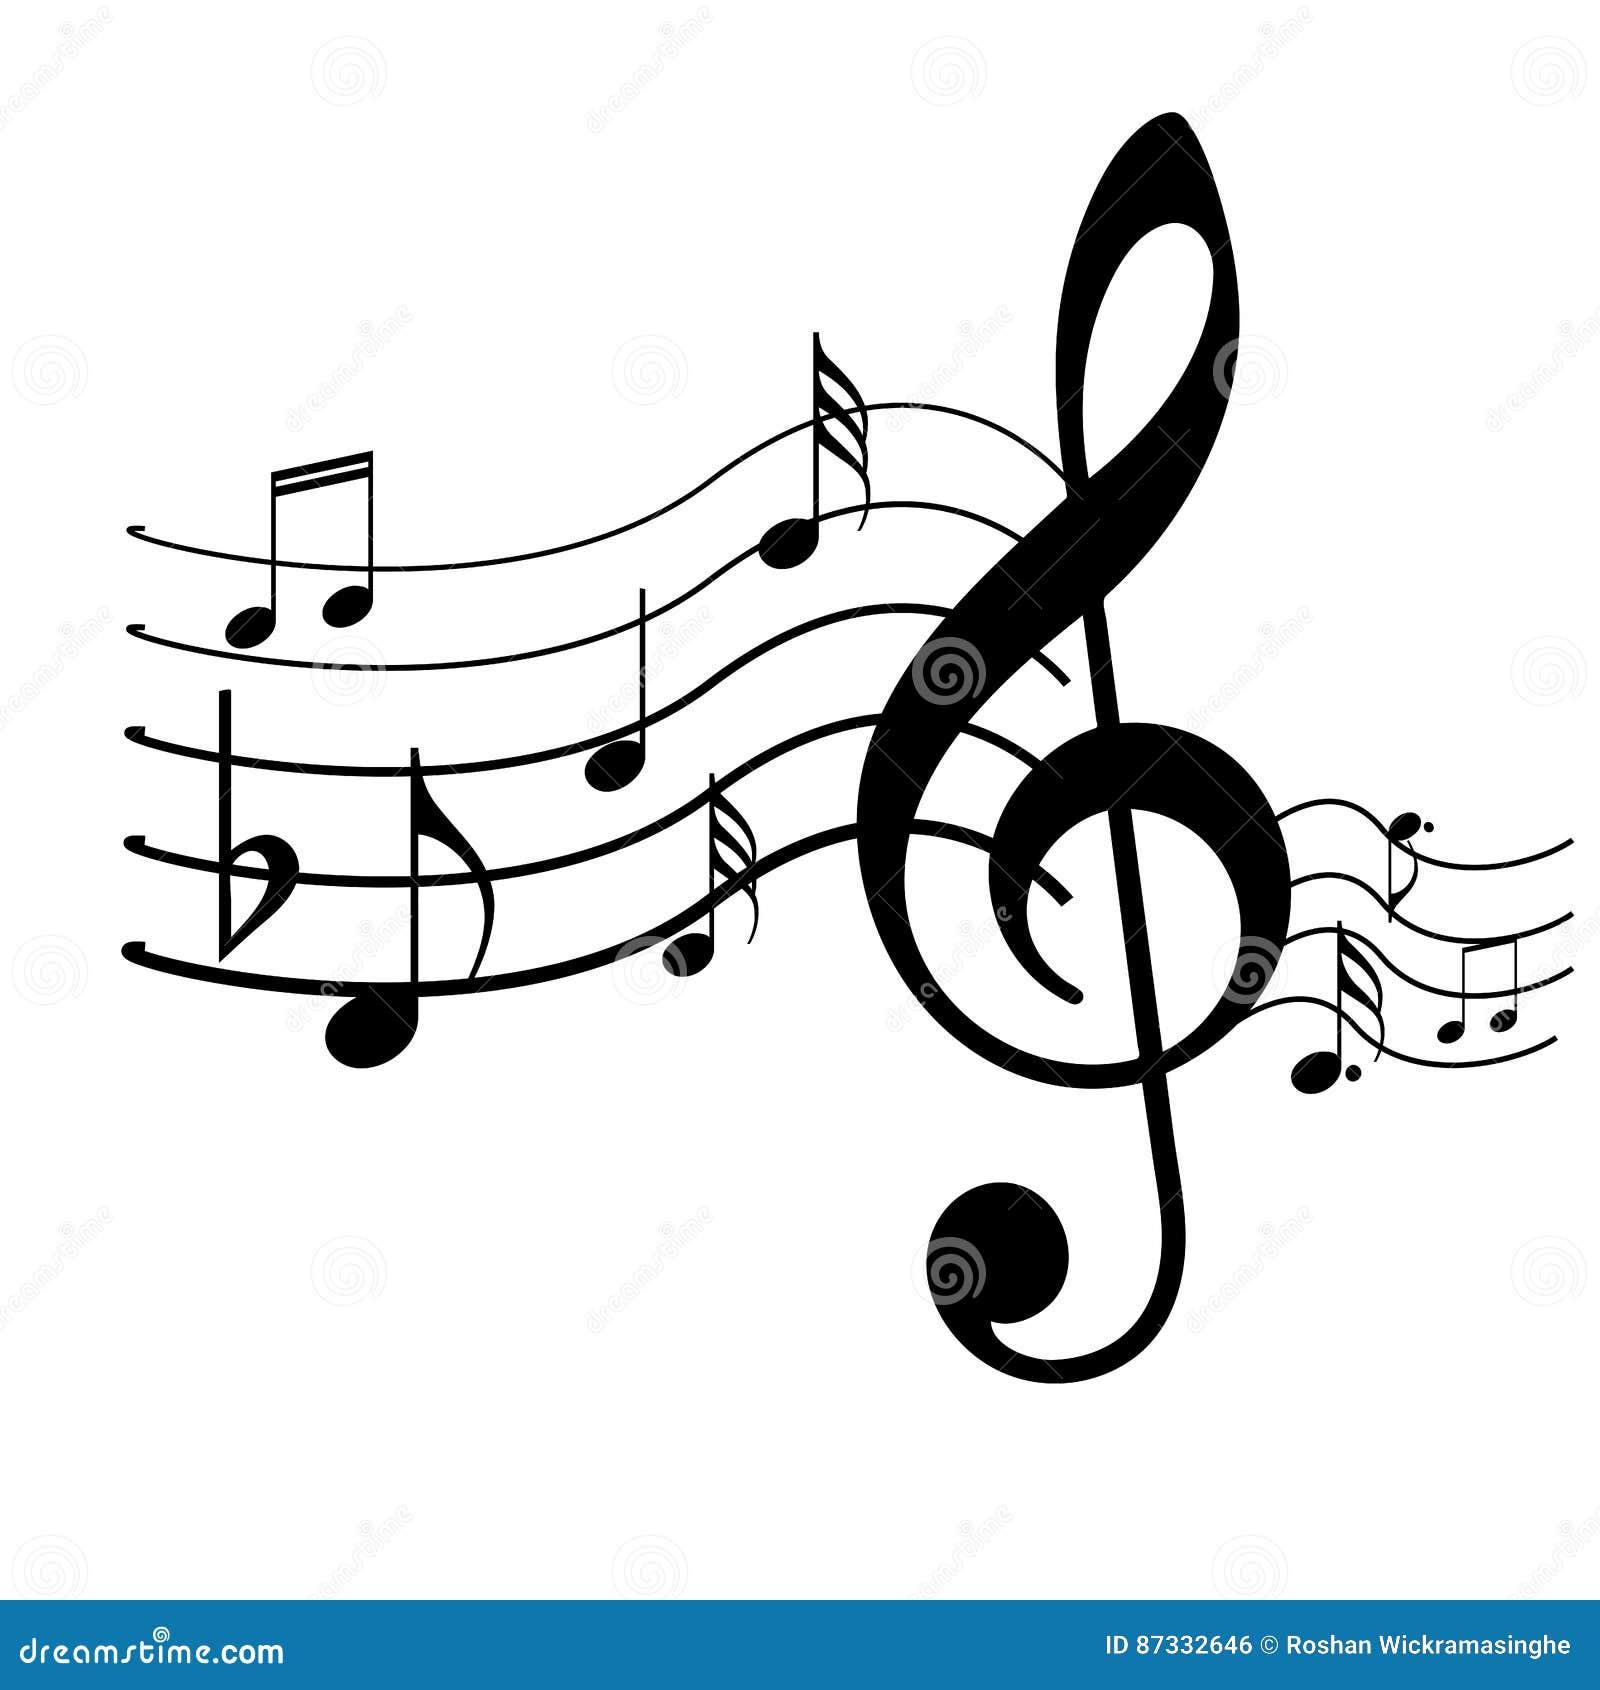 Music Symbols Design Stock Vector Illustration Of Bars 87332646